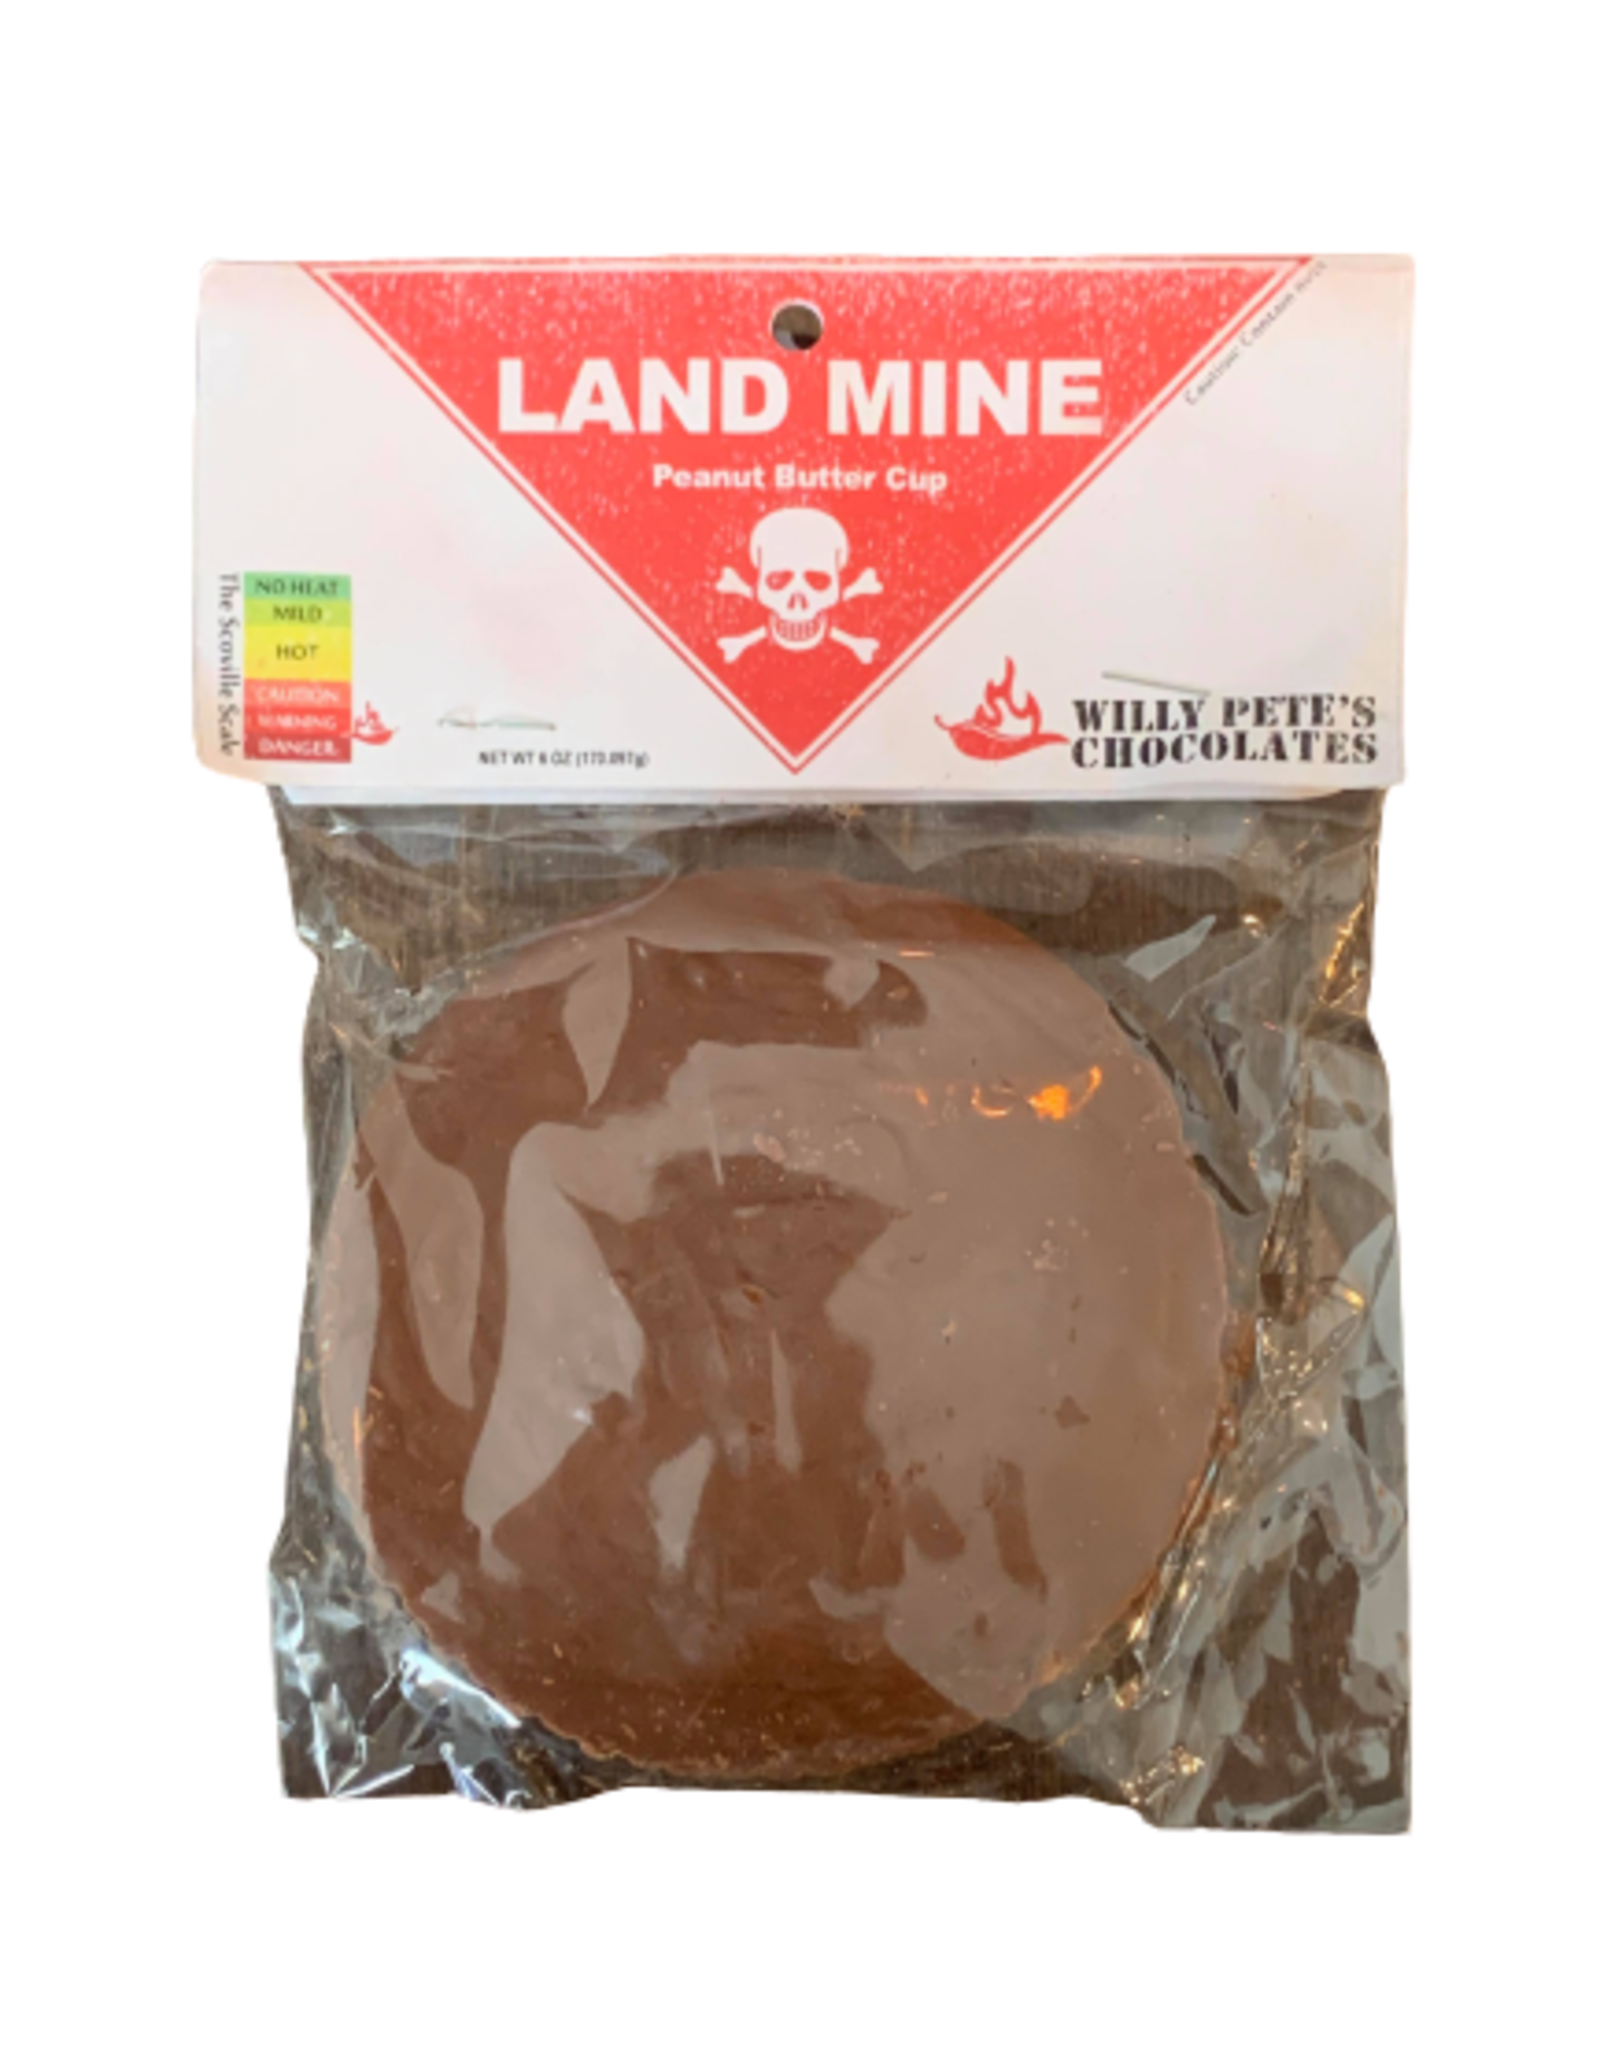 Willy pete's Land Mine